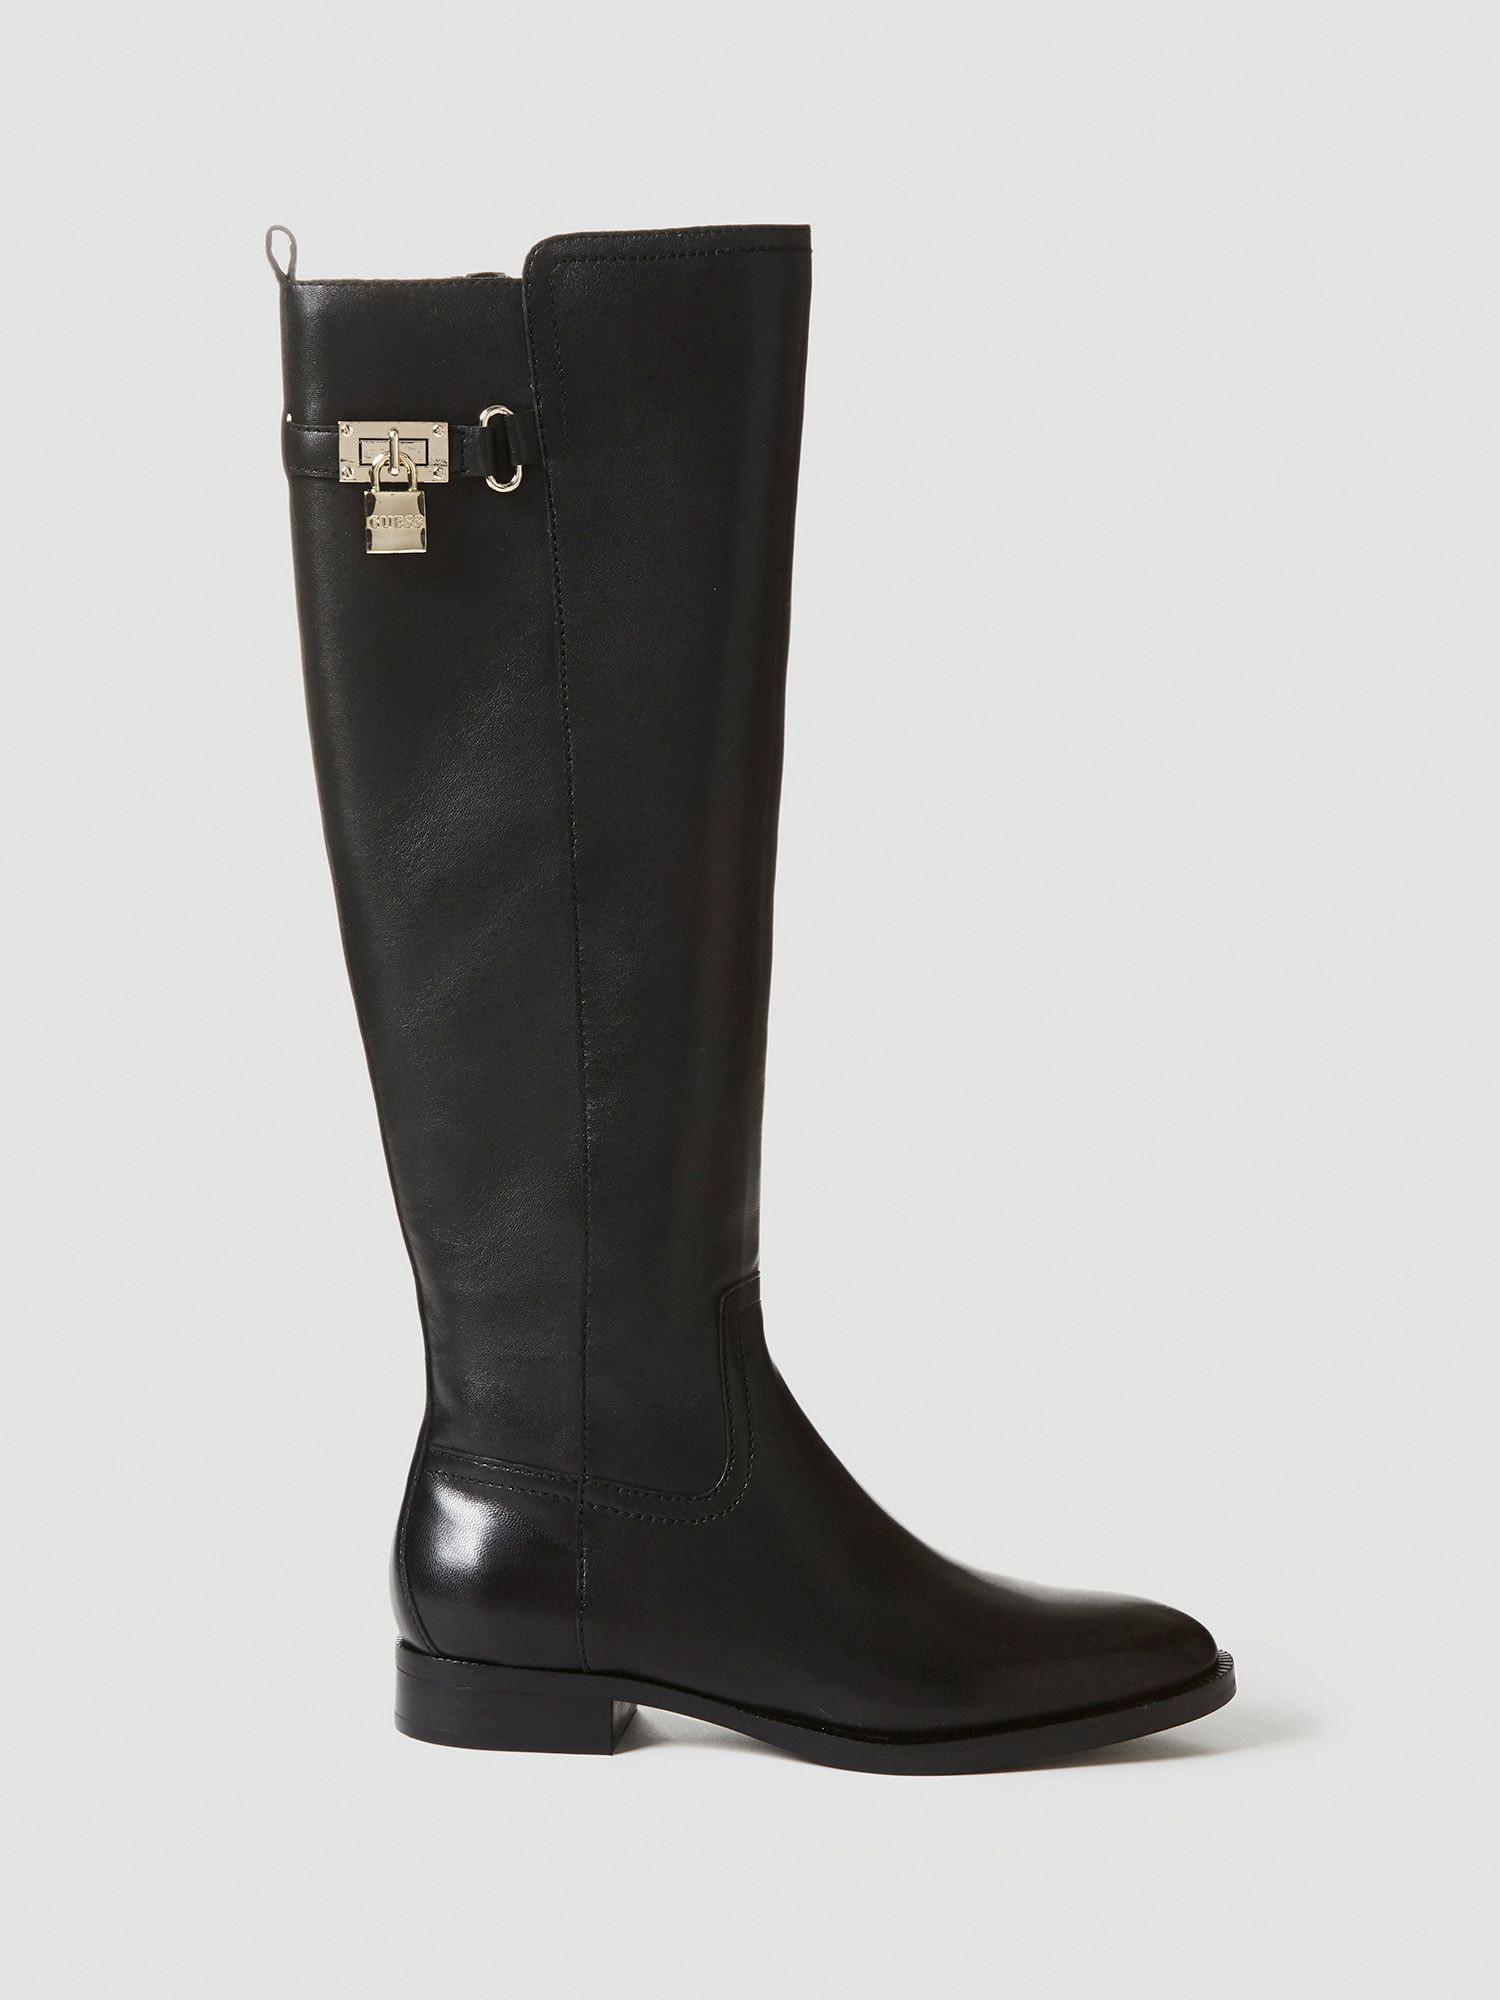 Guess Stiefel Stiefel Guess für Damen bei imwalking.de fa0c23